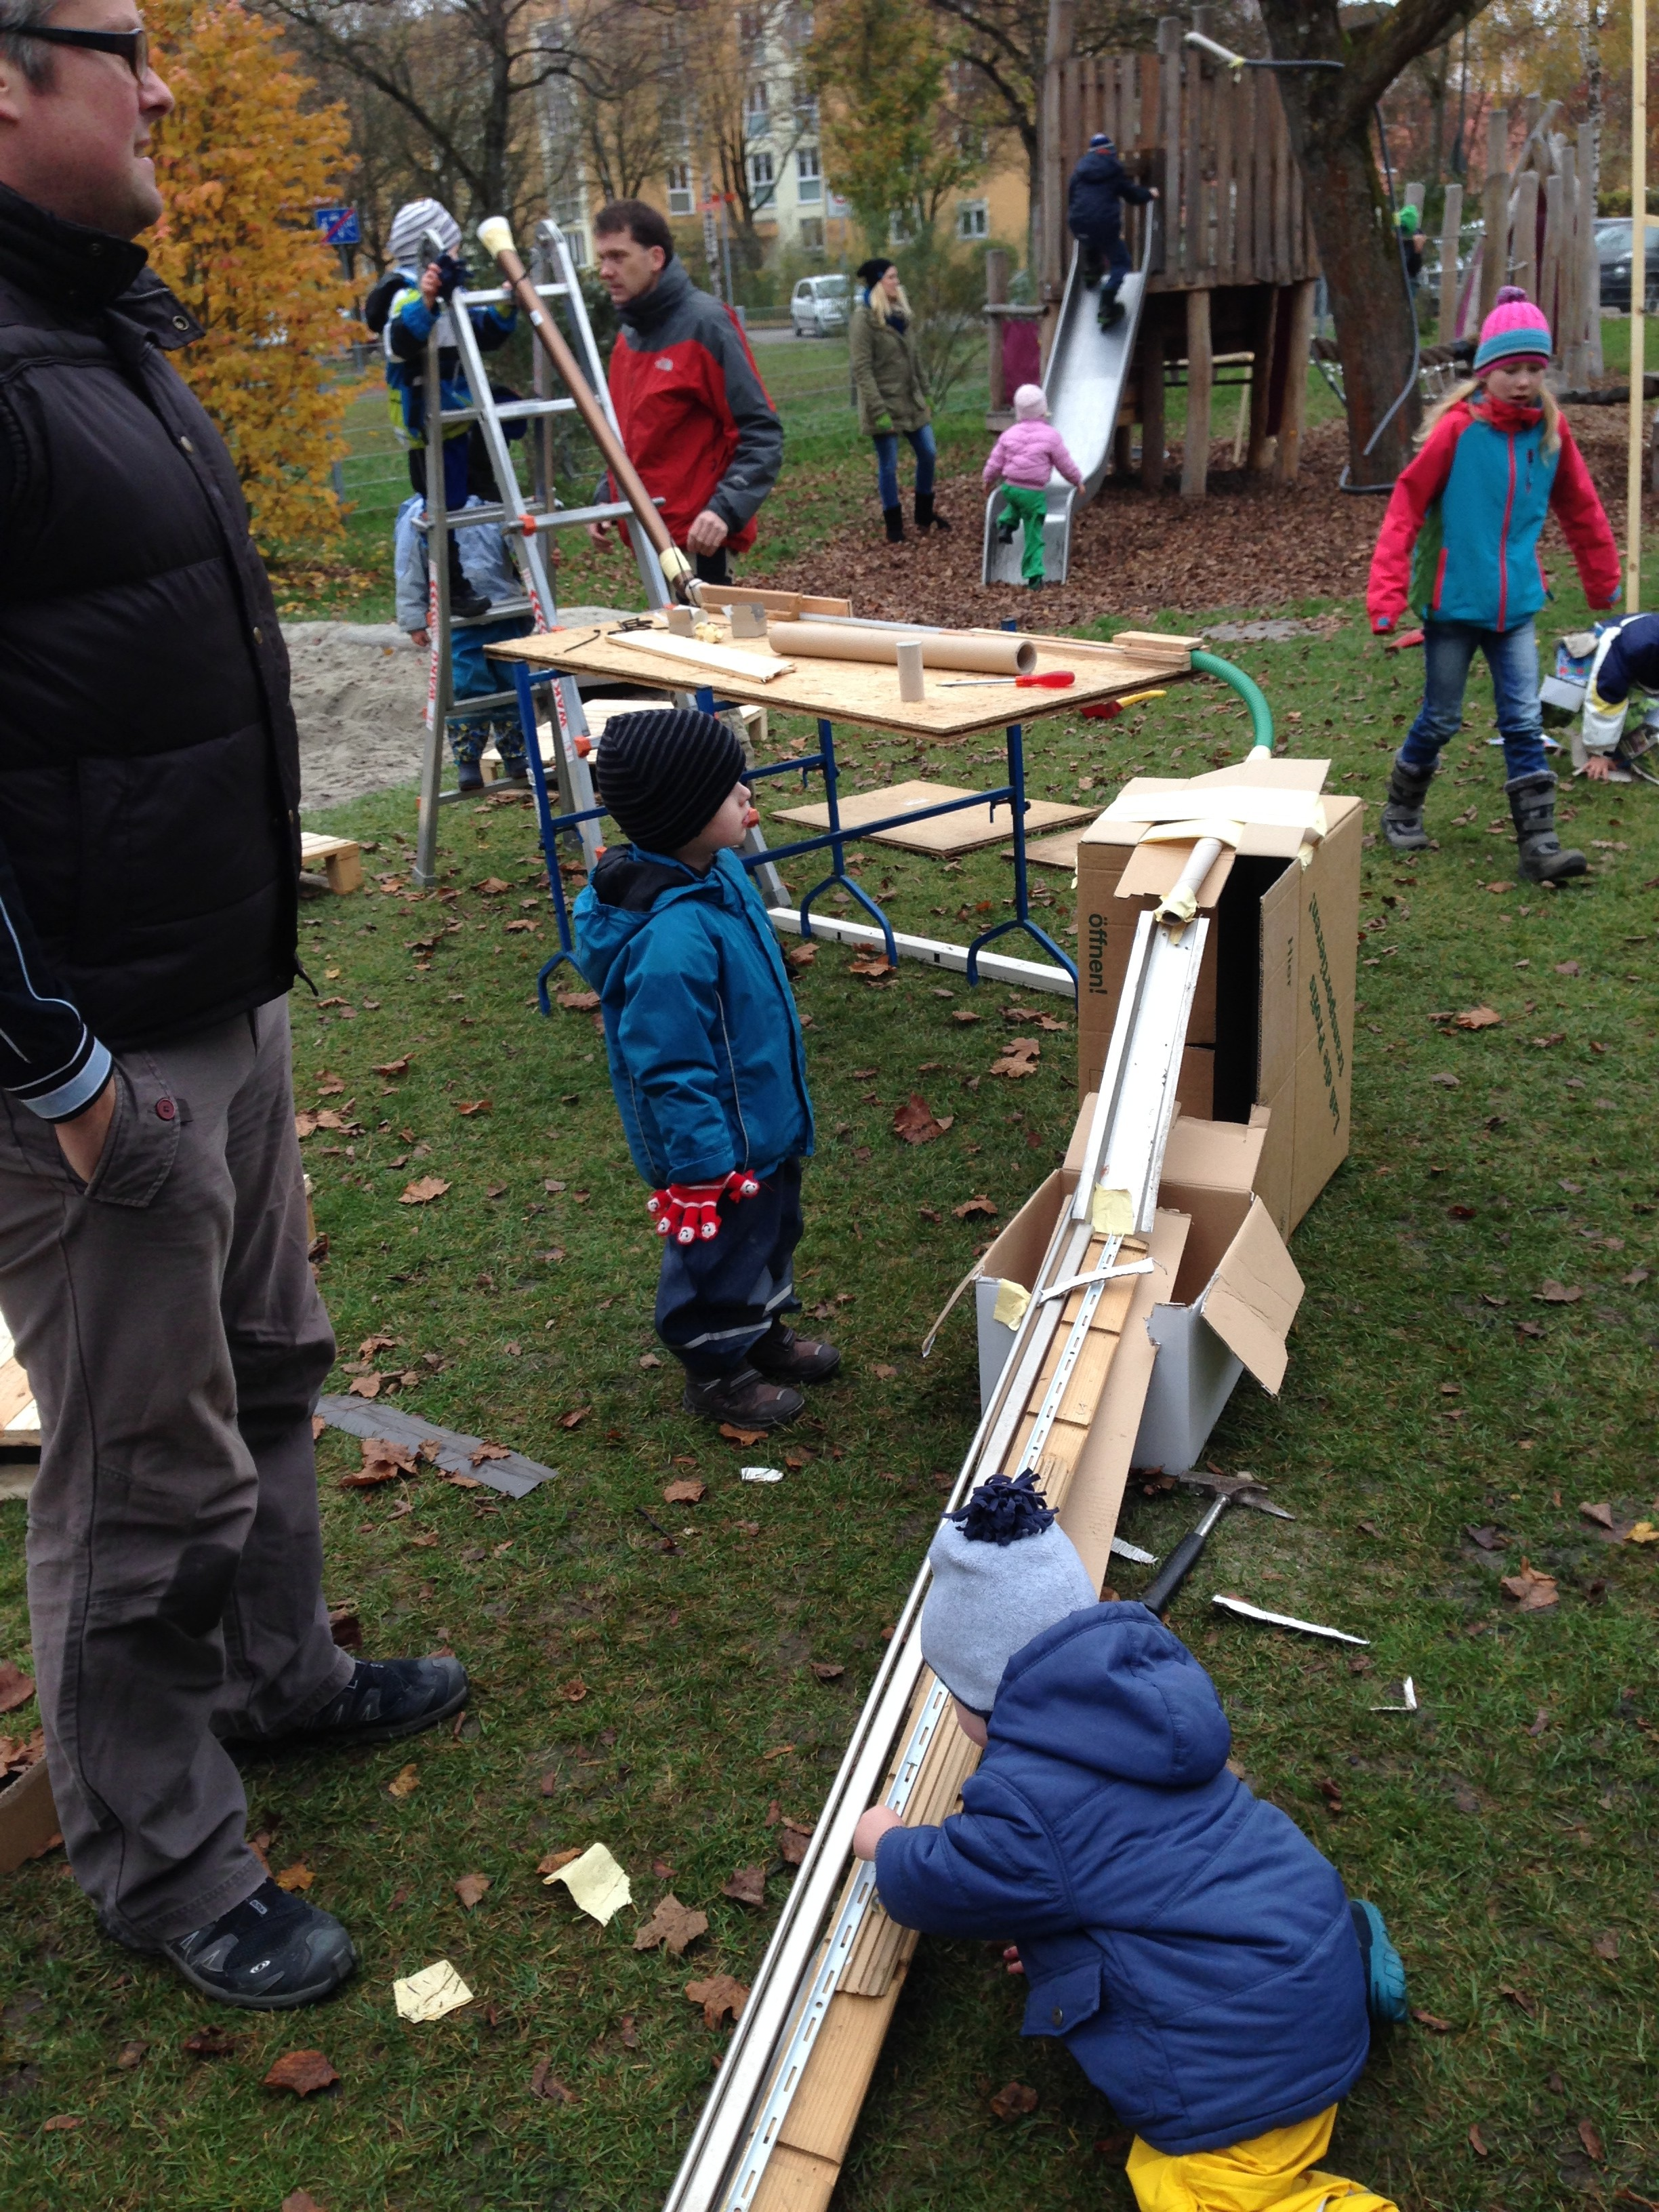 kreativer murmelbahn vormittag kinderspielraum e v dachau. Black Bedroom Furniture Sets. Home Design Ideas